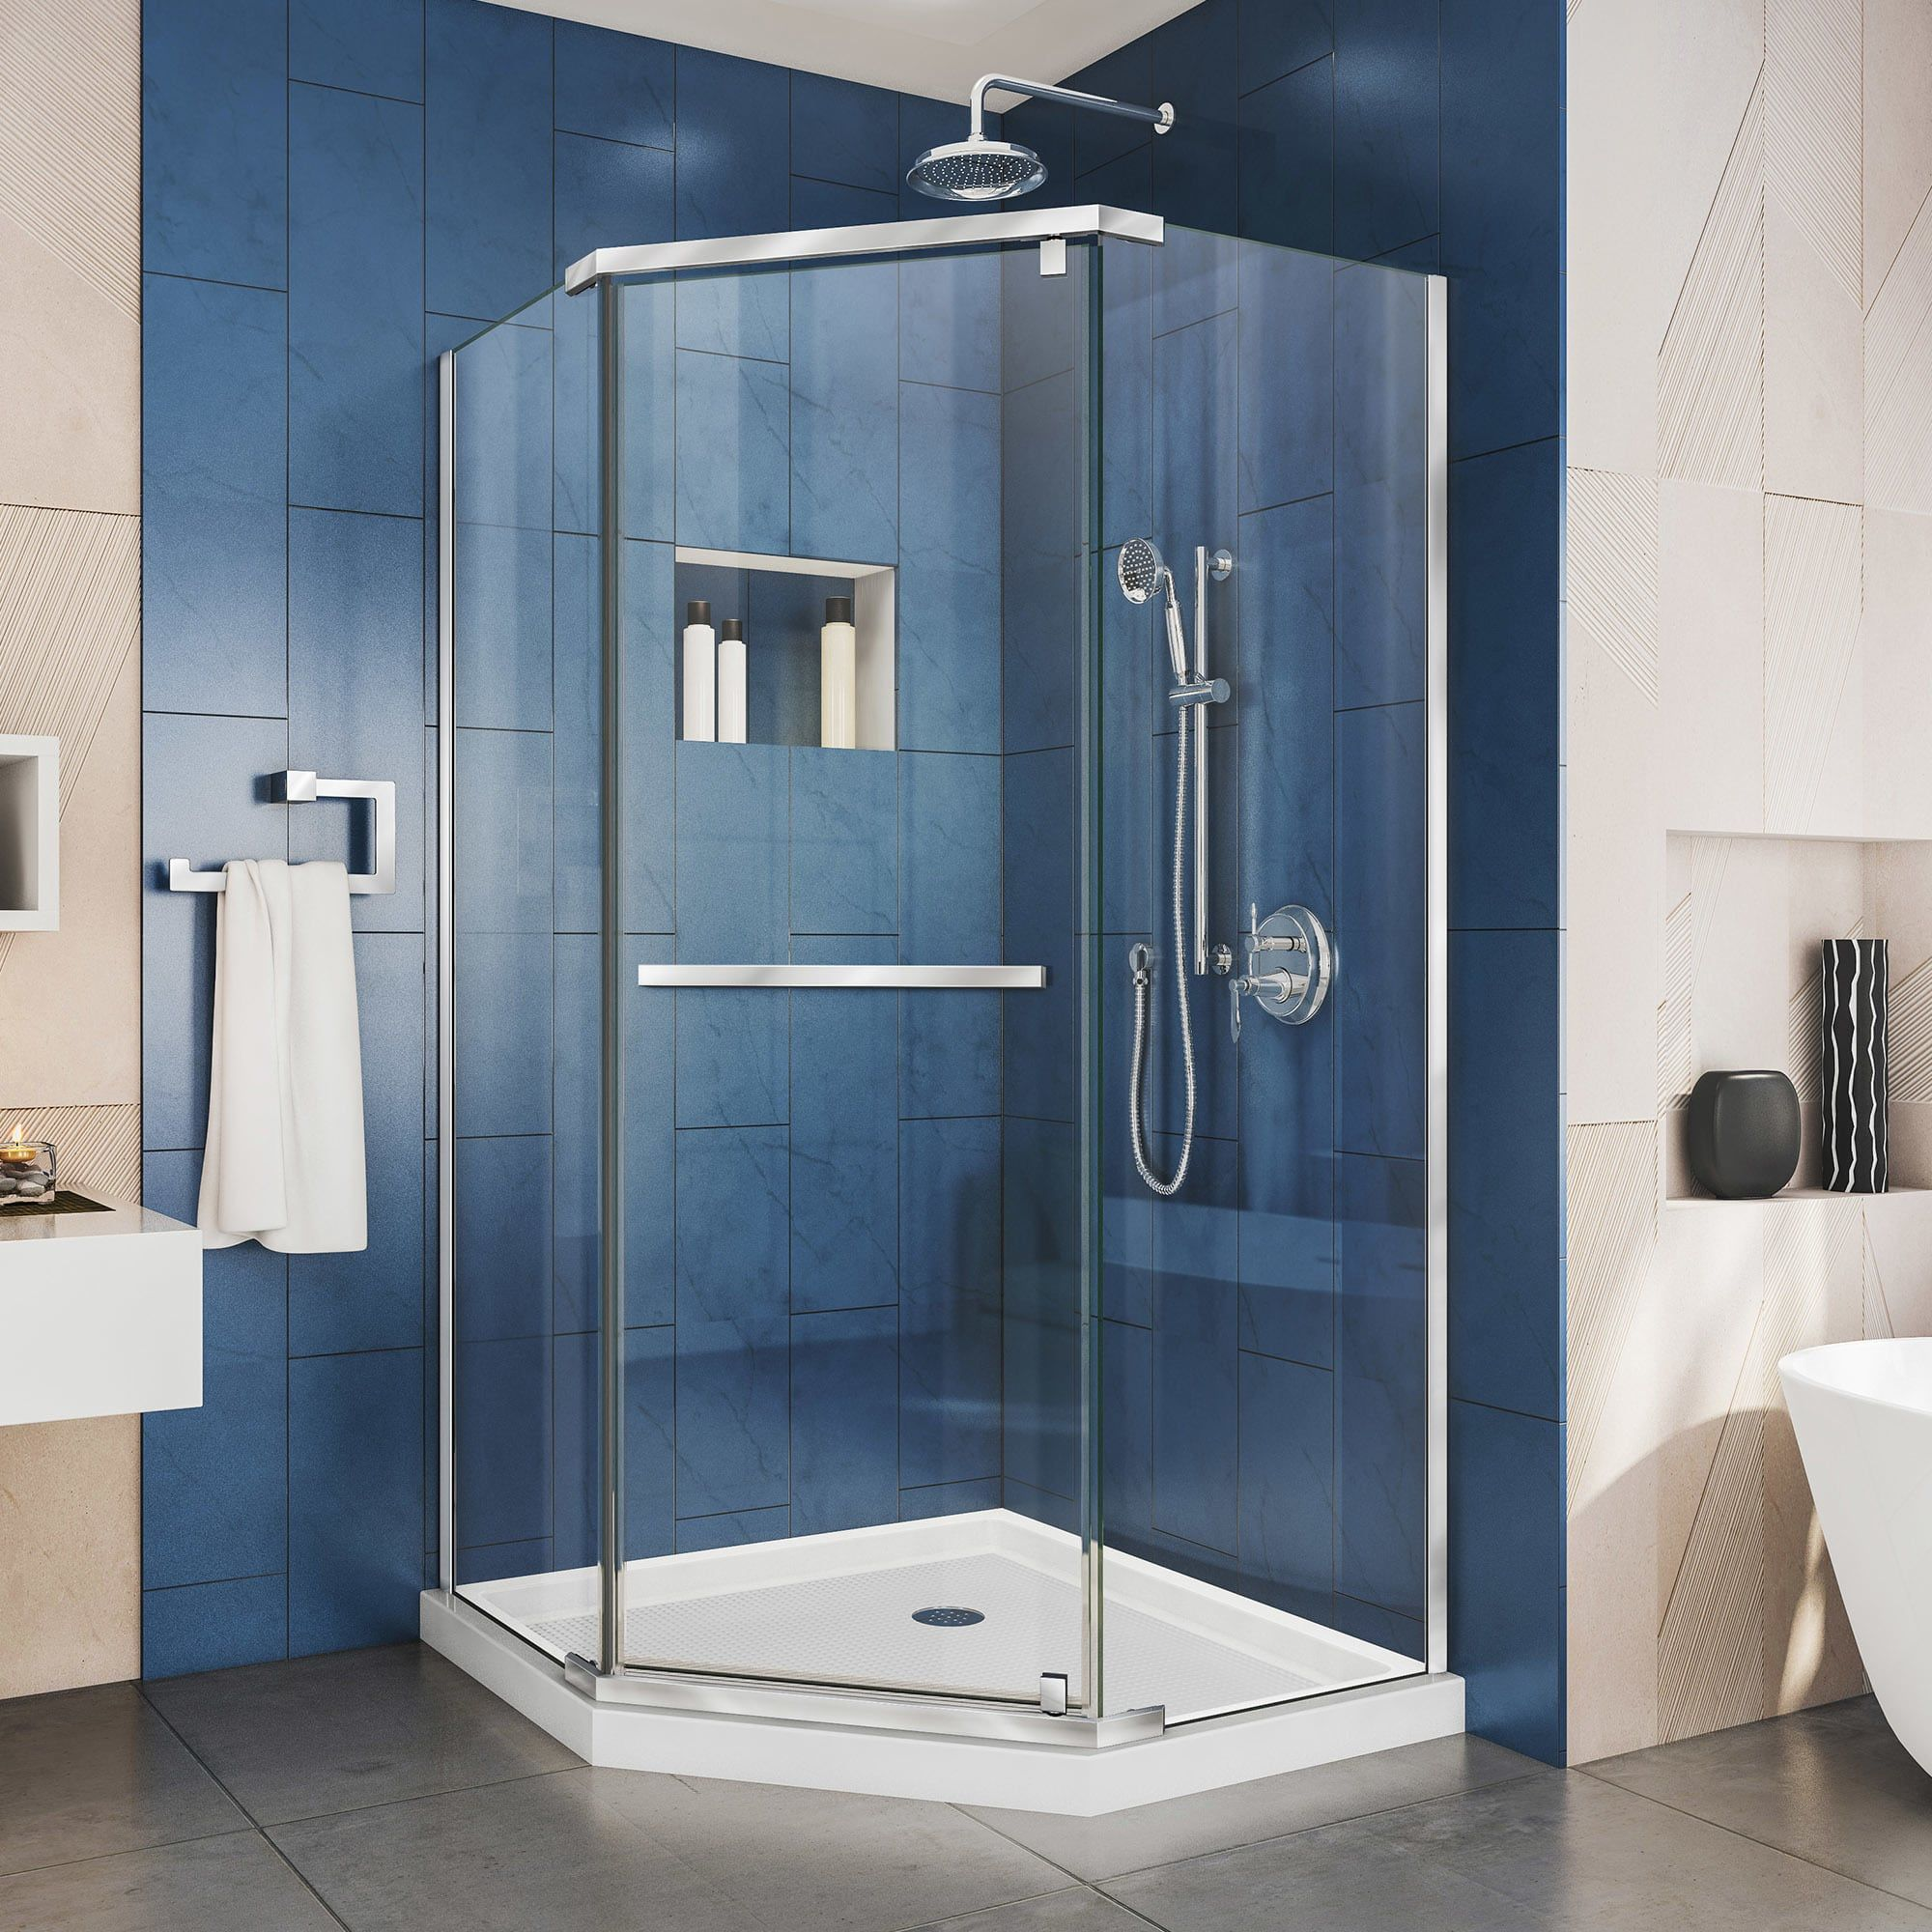 Fantastic What Is Vikrell Material Image - Bathtub Ideas - dilata.info